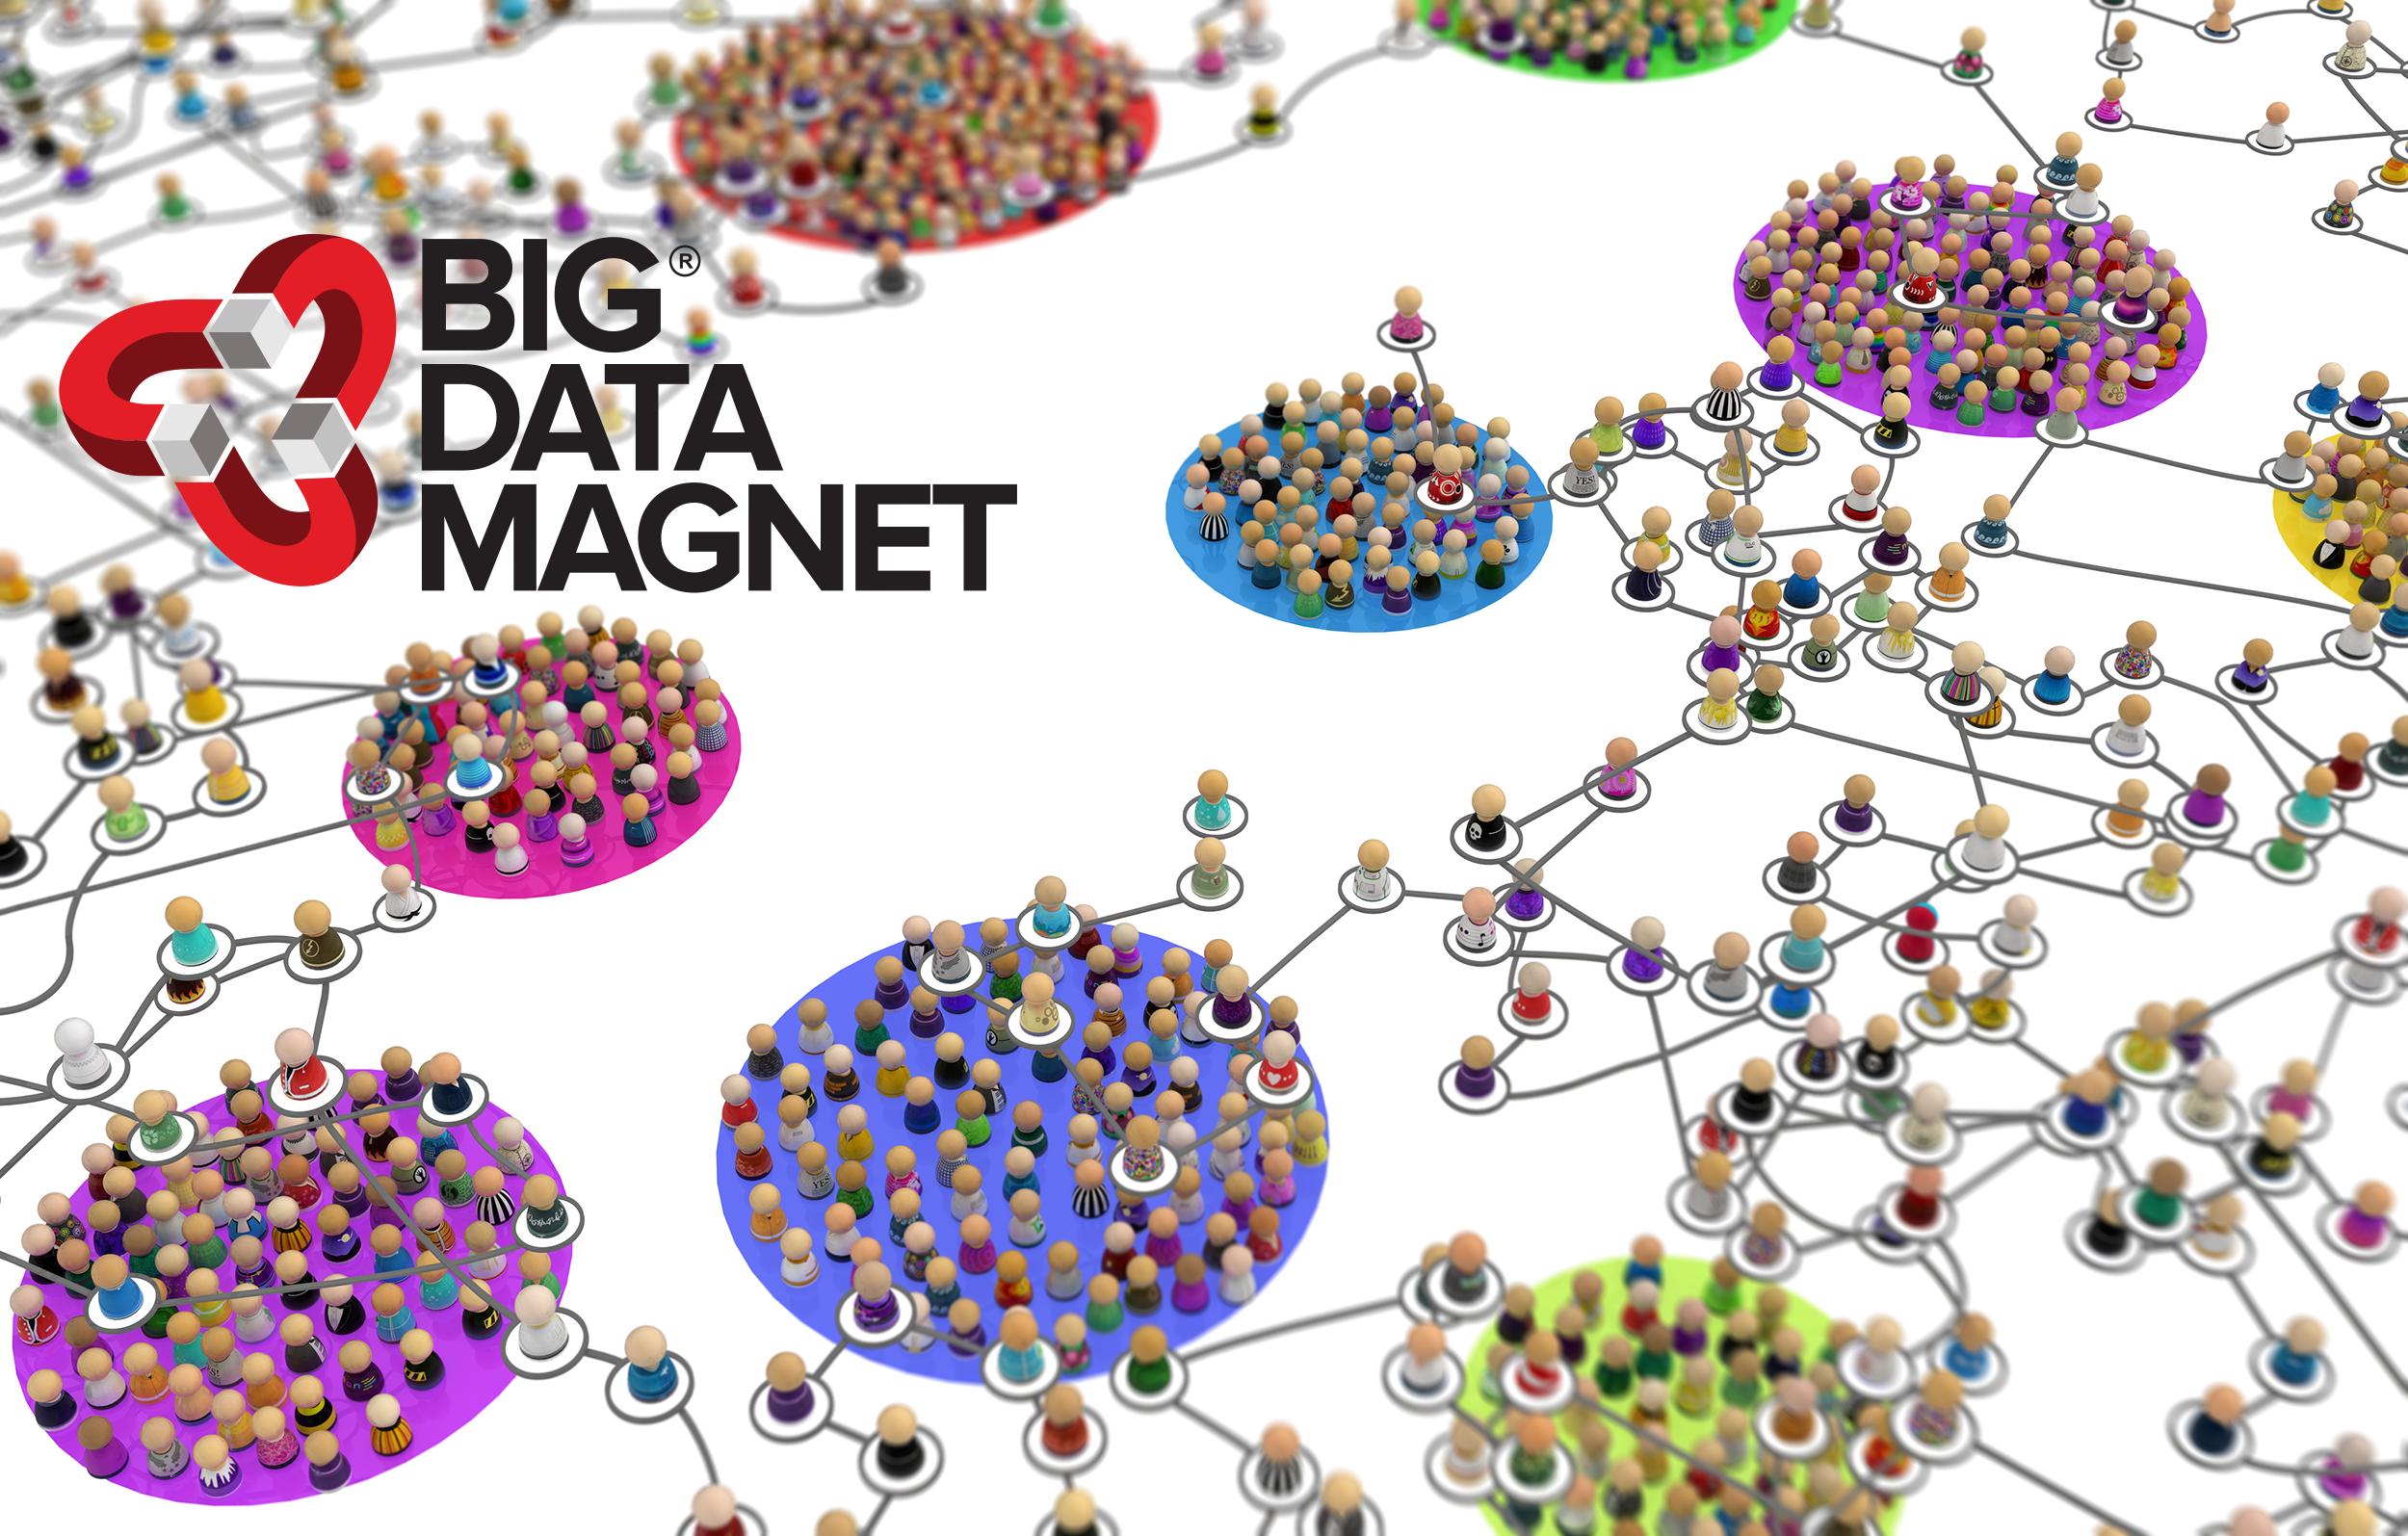 Big-Data-Magnet-Focus-Group-Segmentatio.png